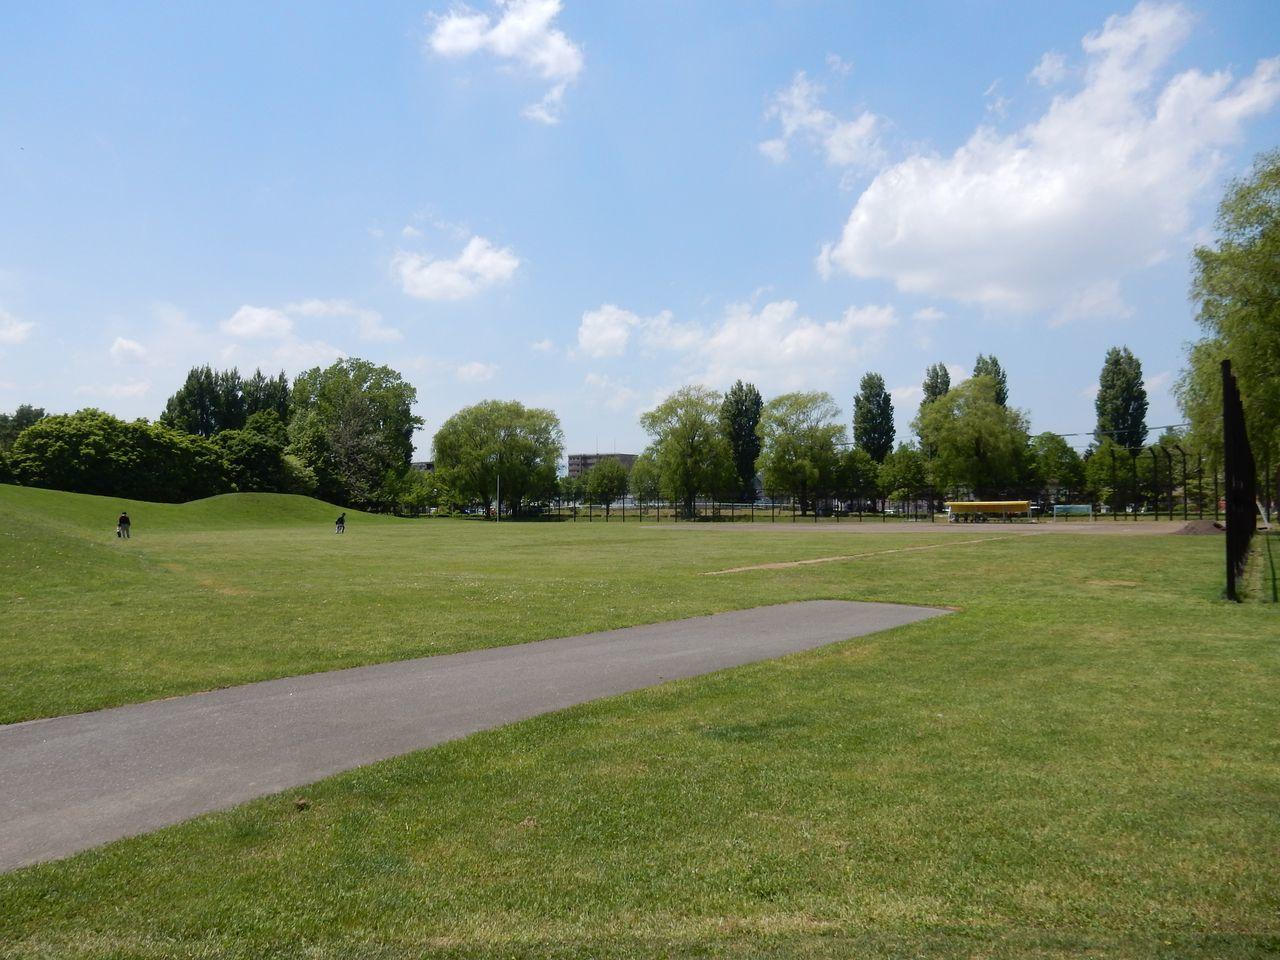 初夏の伏古公園_c0025115_21451028.jpg